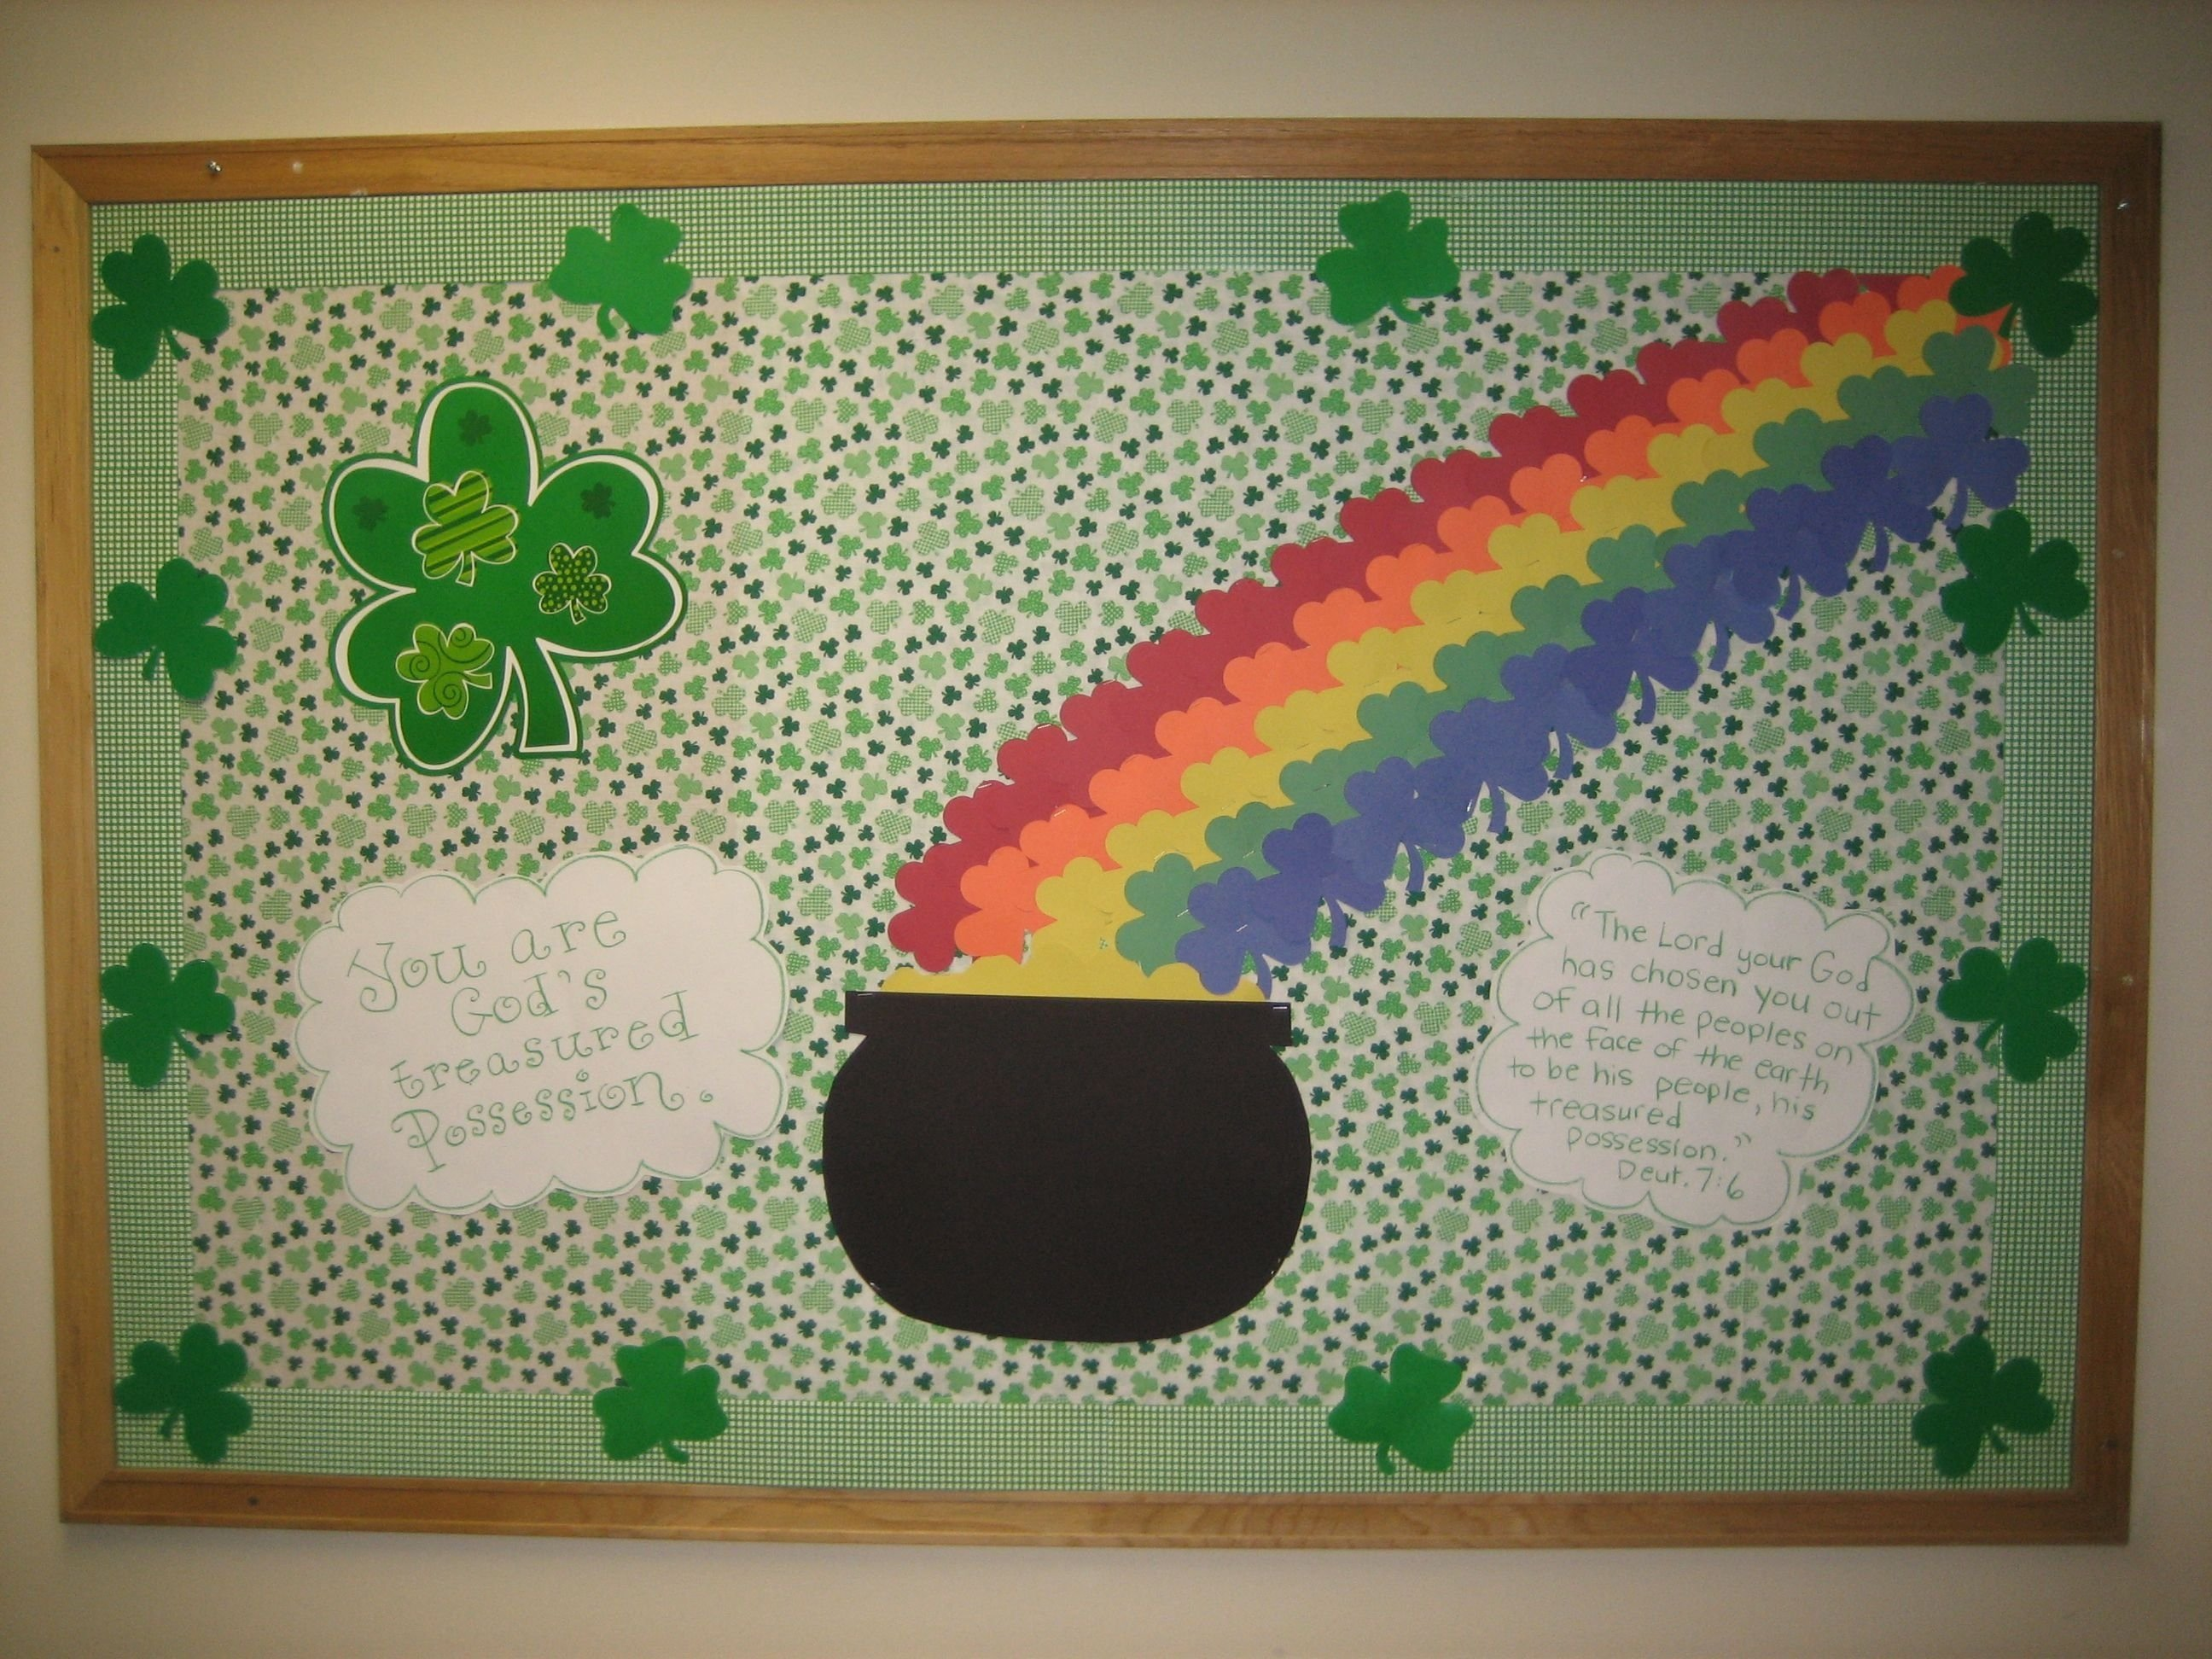 10 Amazing St Patrick Day Bulletin Board Ideas happy st patricks day happy home friends church bulletin boards